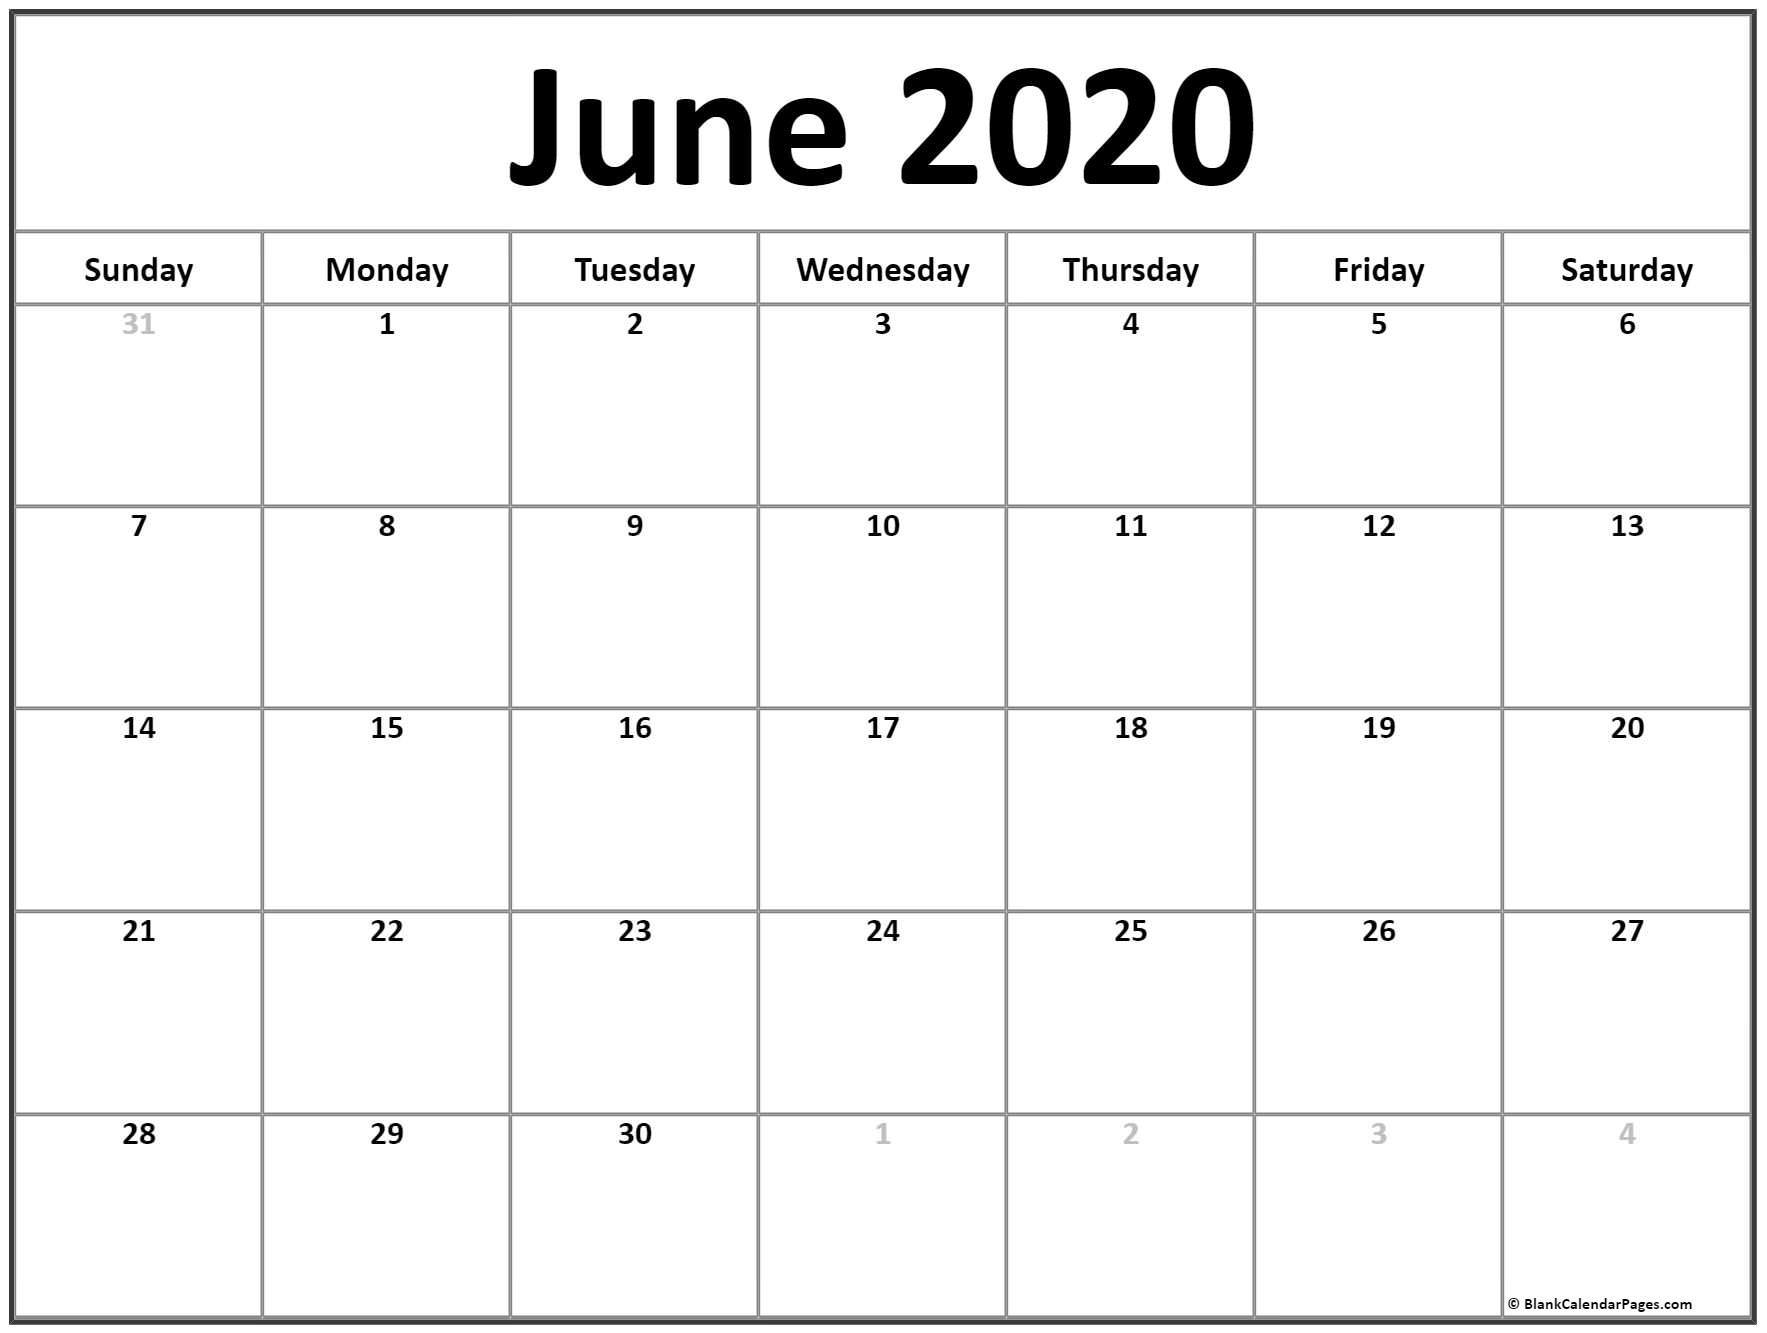 June 2020 Calendar | Free Printable Monthly Calendars  Calendar To Write On 2020